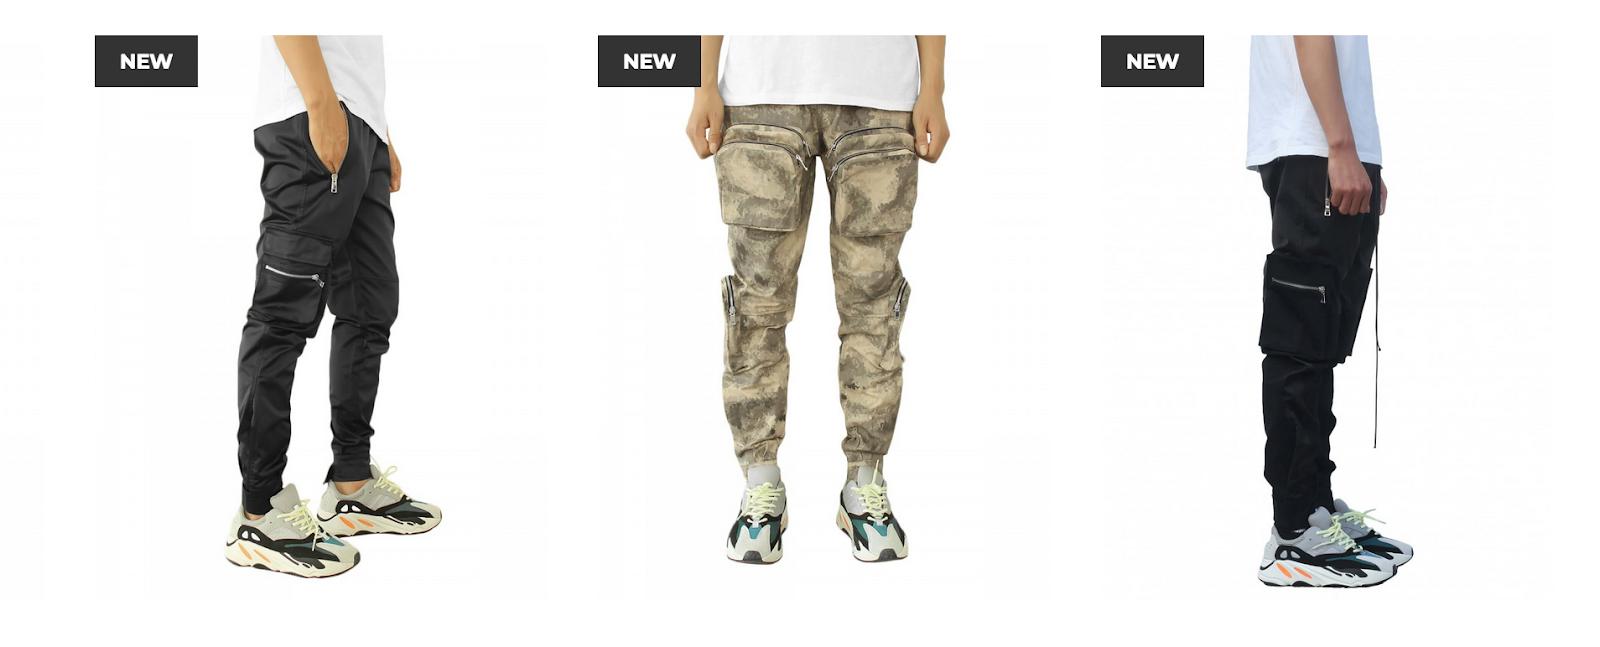 Black military pants + camo pants | URKOOL